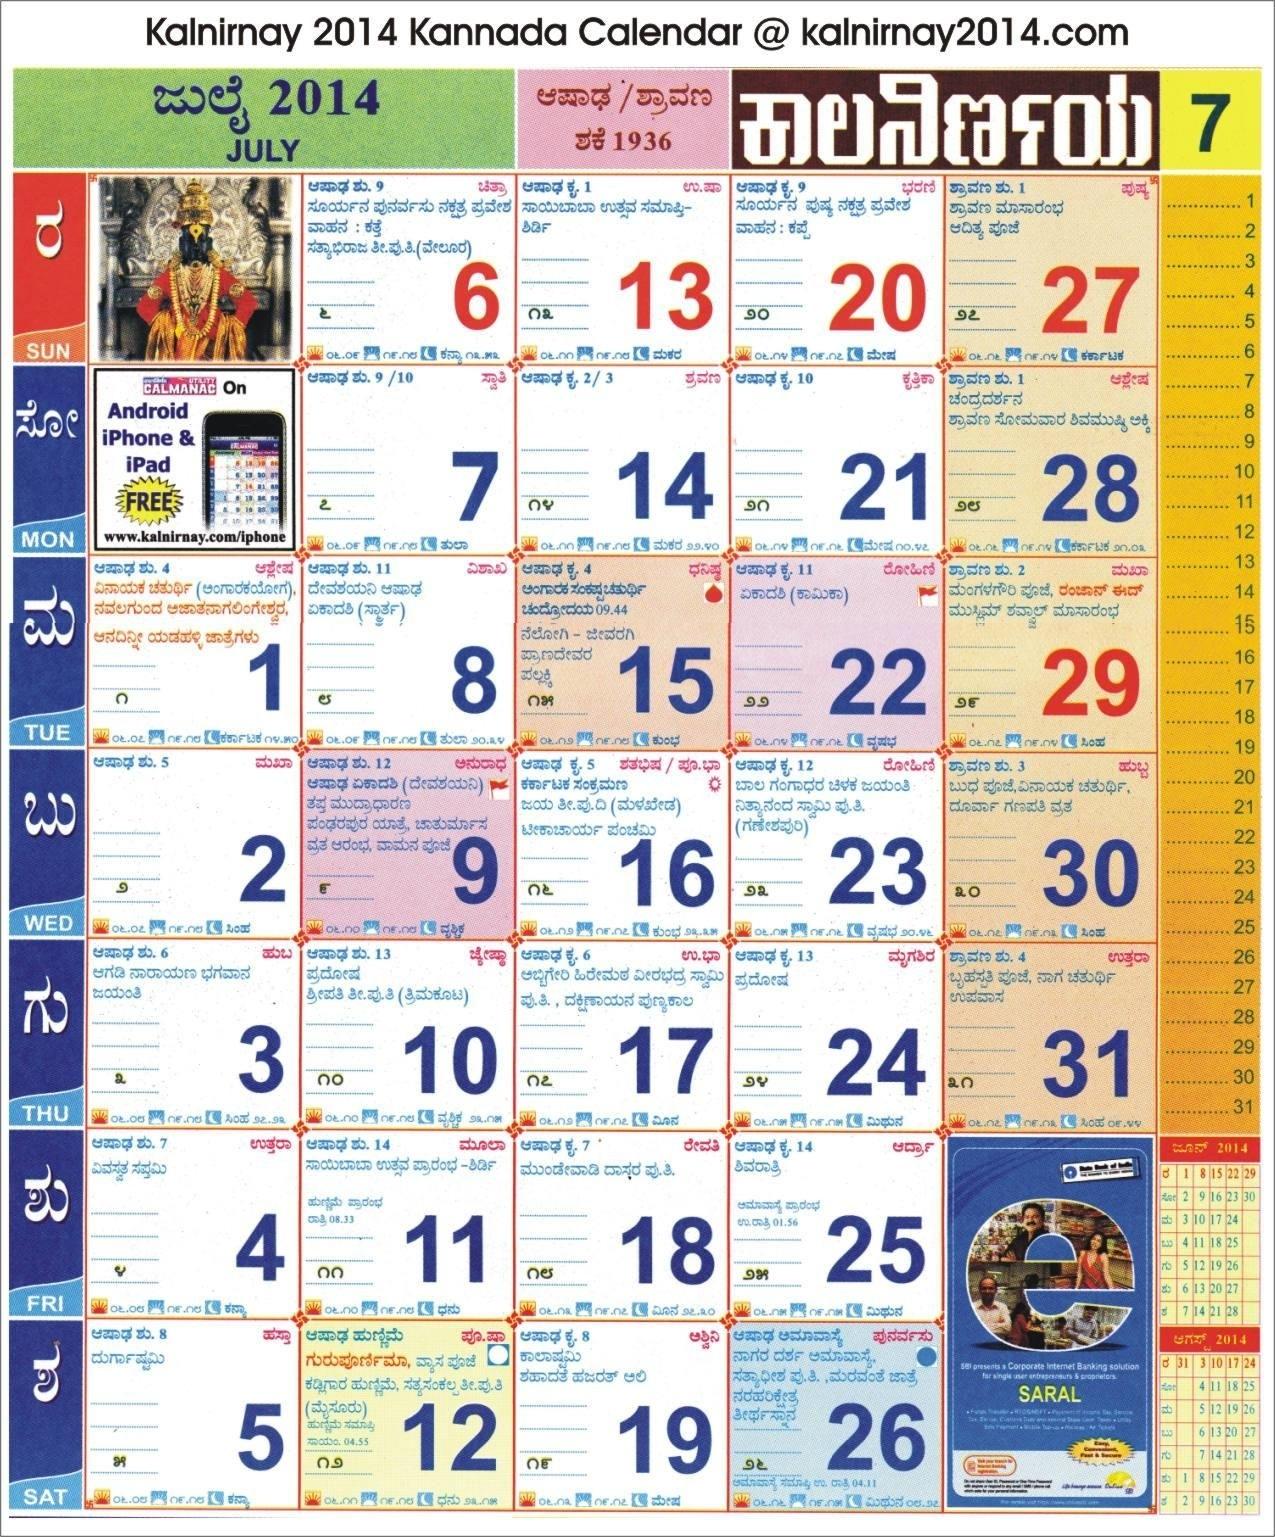 July 2014 Kannada Kalnirnay Calendar | 2014 Kannada Kalnirnay Kannada Calendar Month Names